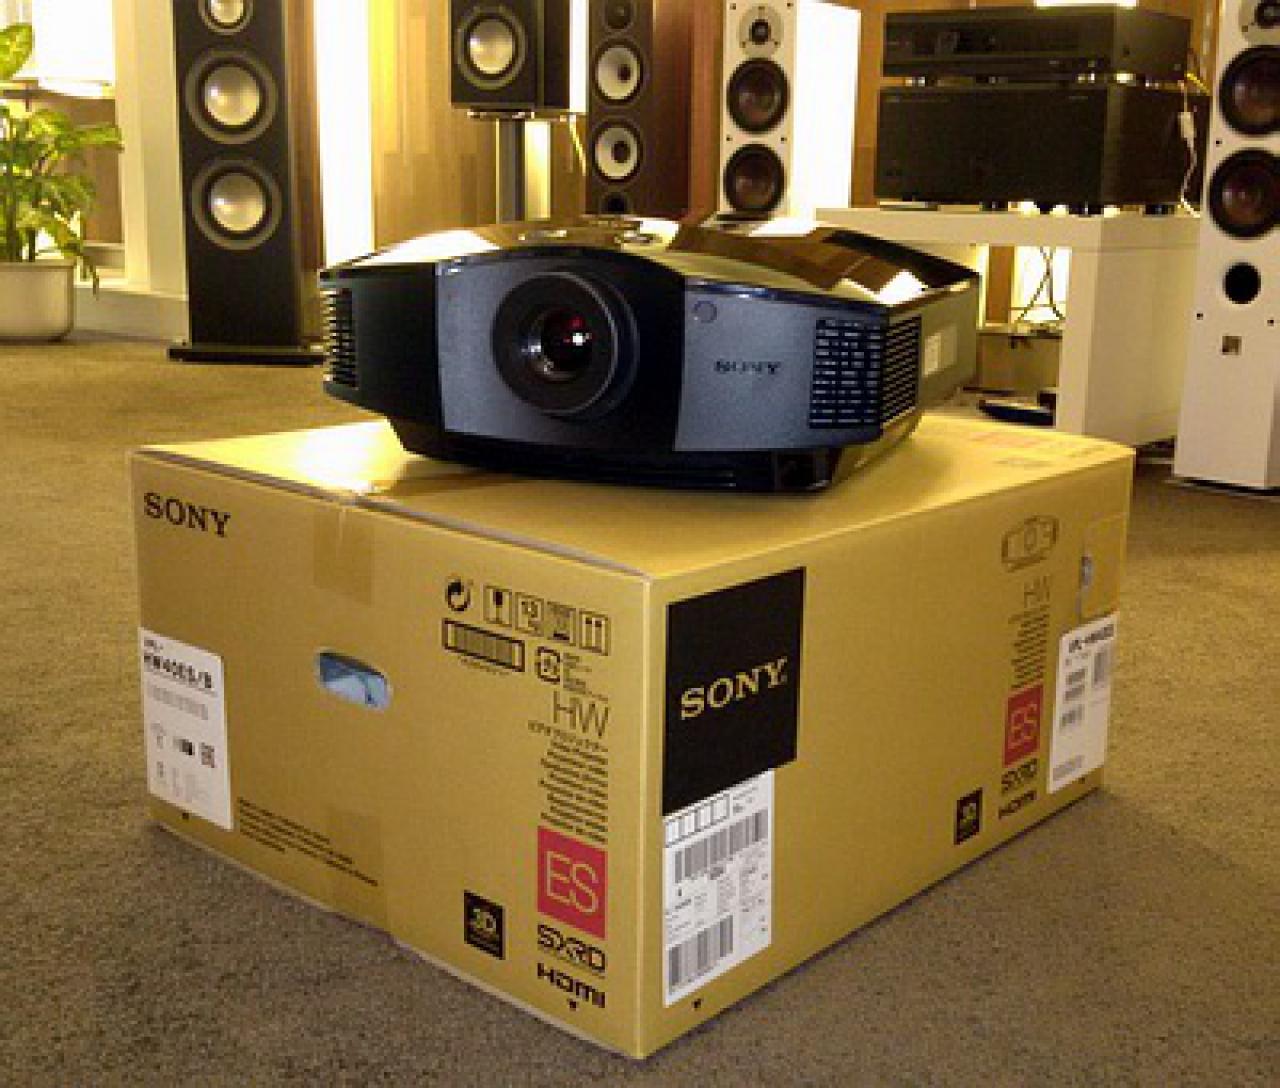 Sony-VPL-HW40-ES-Heimkino-Berlin-2